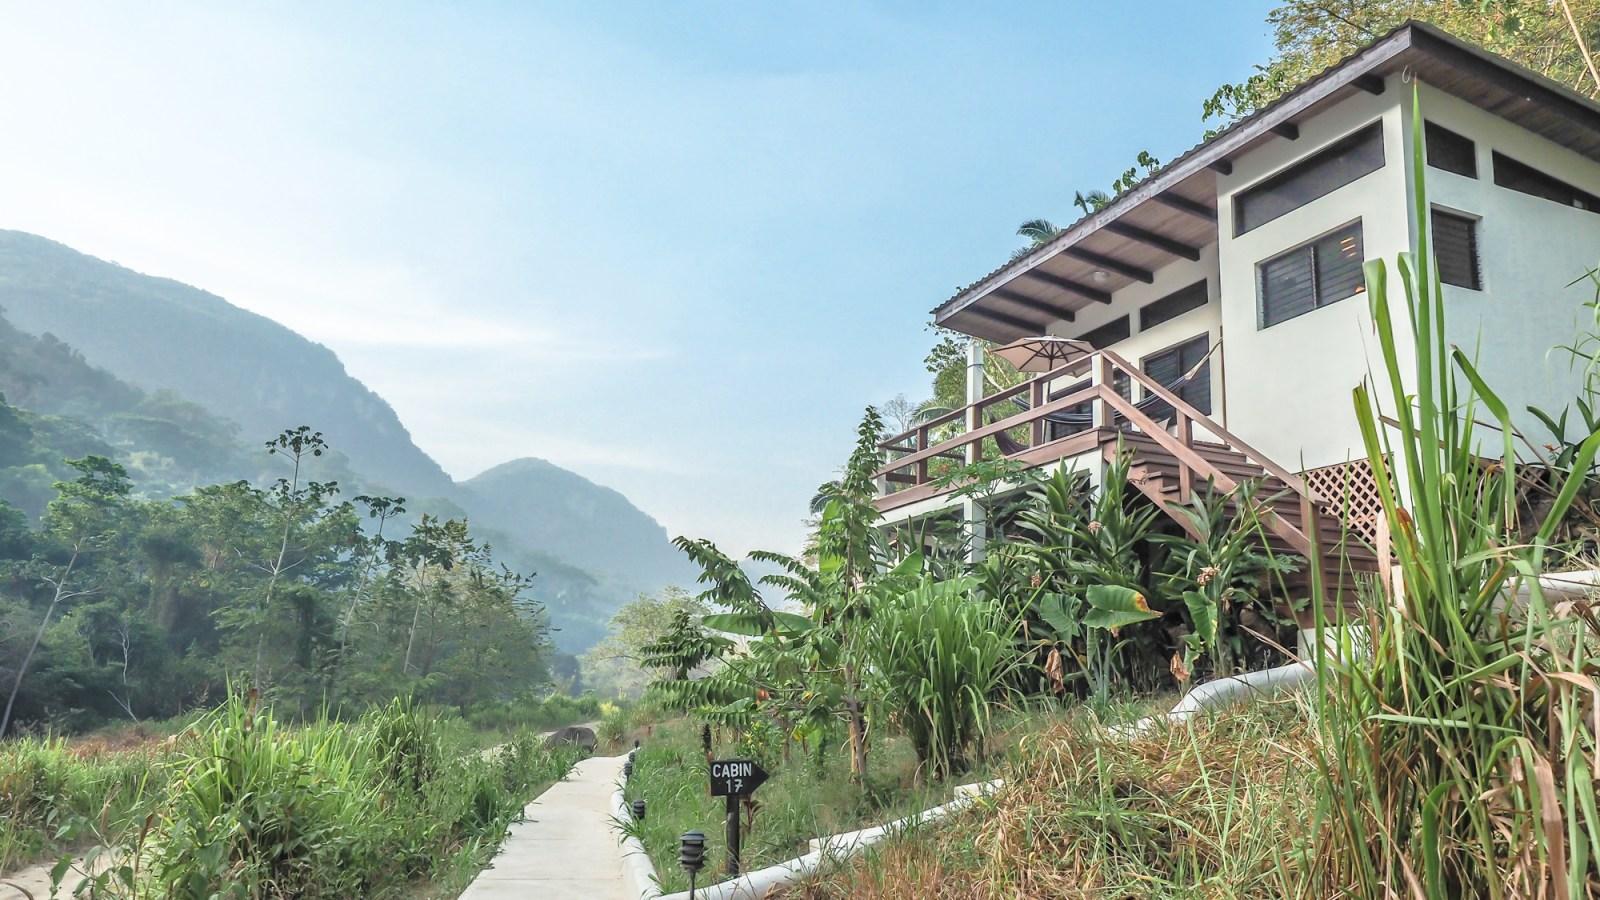 Review of Black Rock Lodge outside San Ignacio, Belize | Eco-lodge in the jungle | #belize #jungle #rainforest #ecolodge